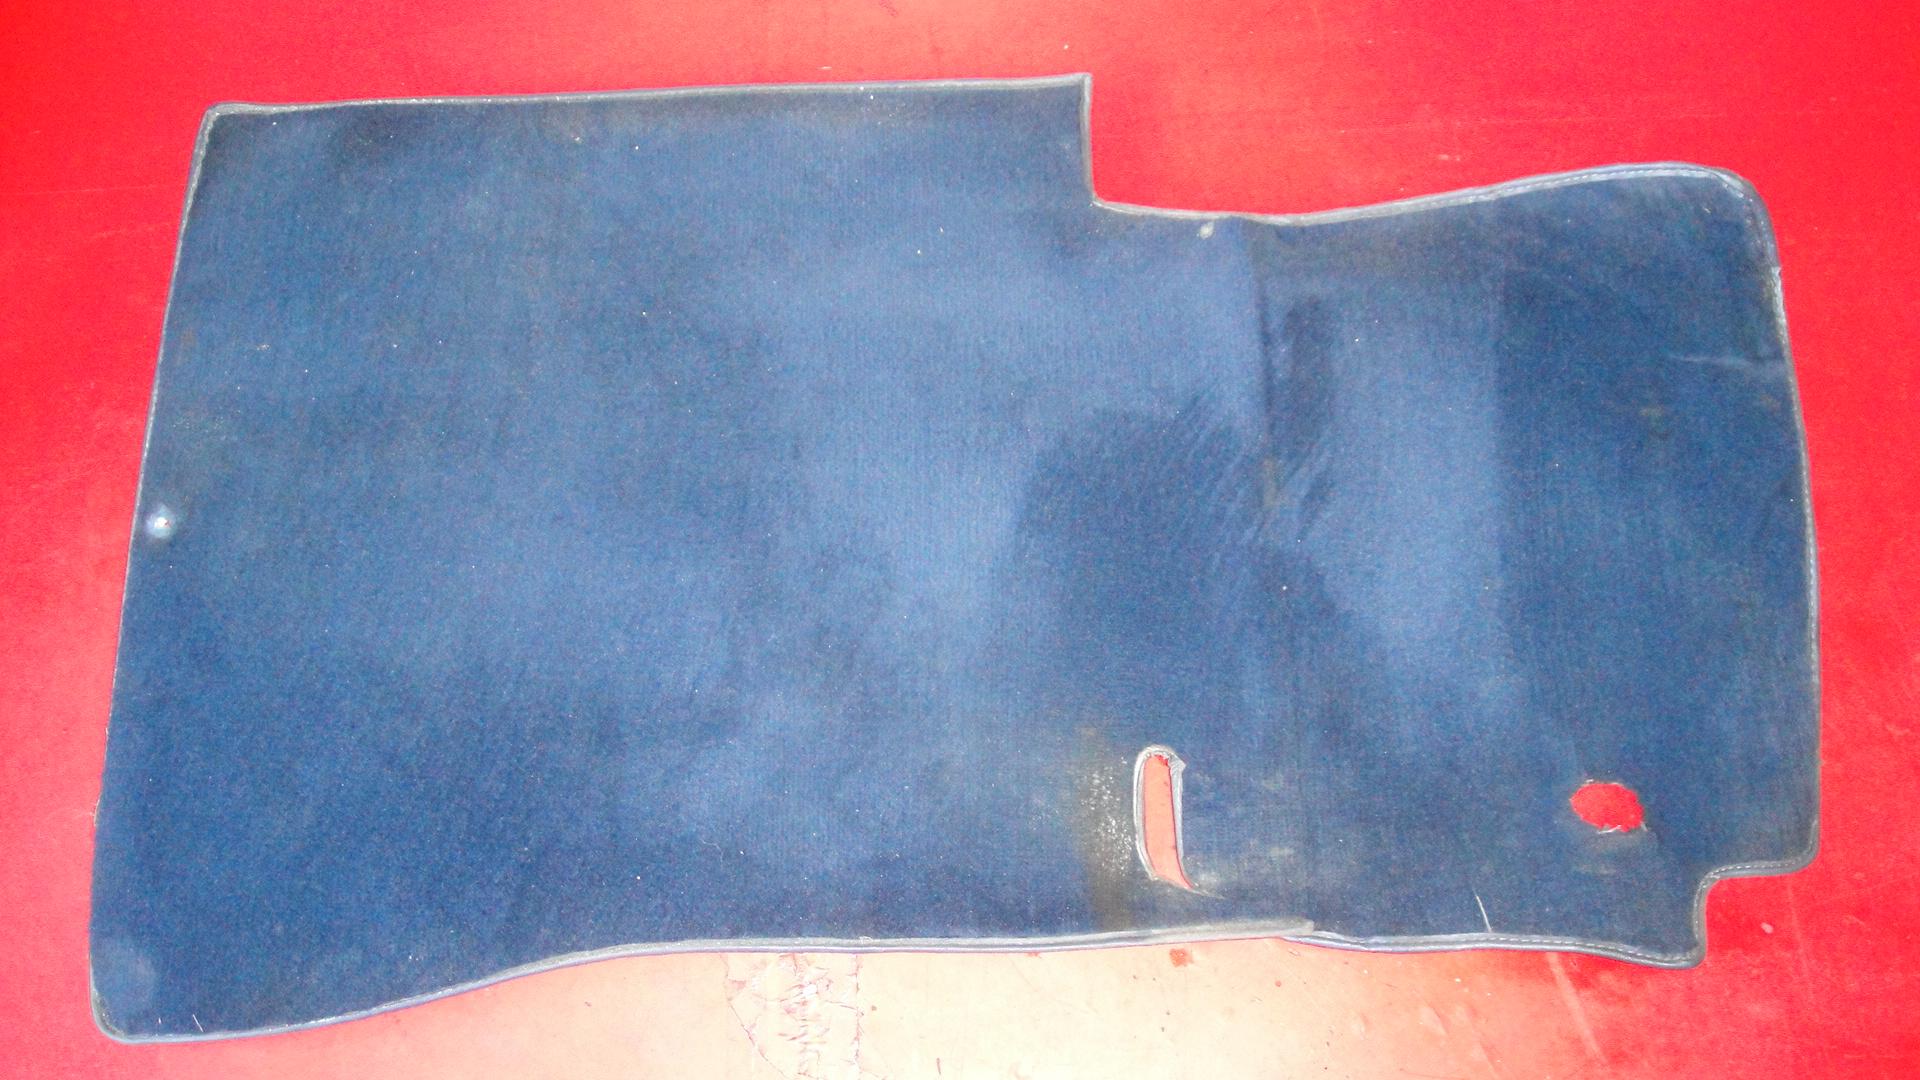 teppich fu raum fahrerseite blau mercedes w126 se sec. Black Bedroom Furniture Sets. Home Design Ideas